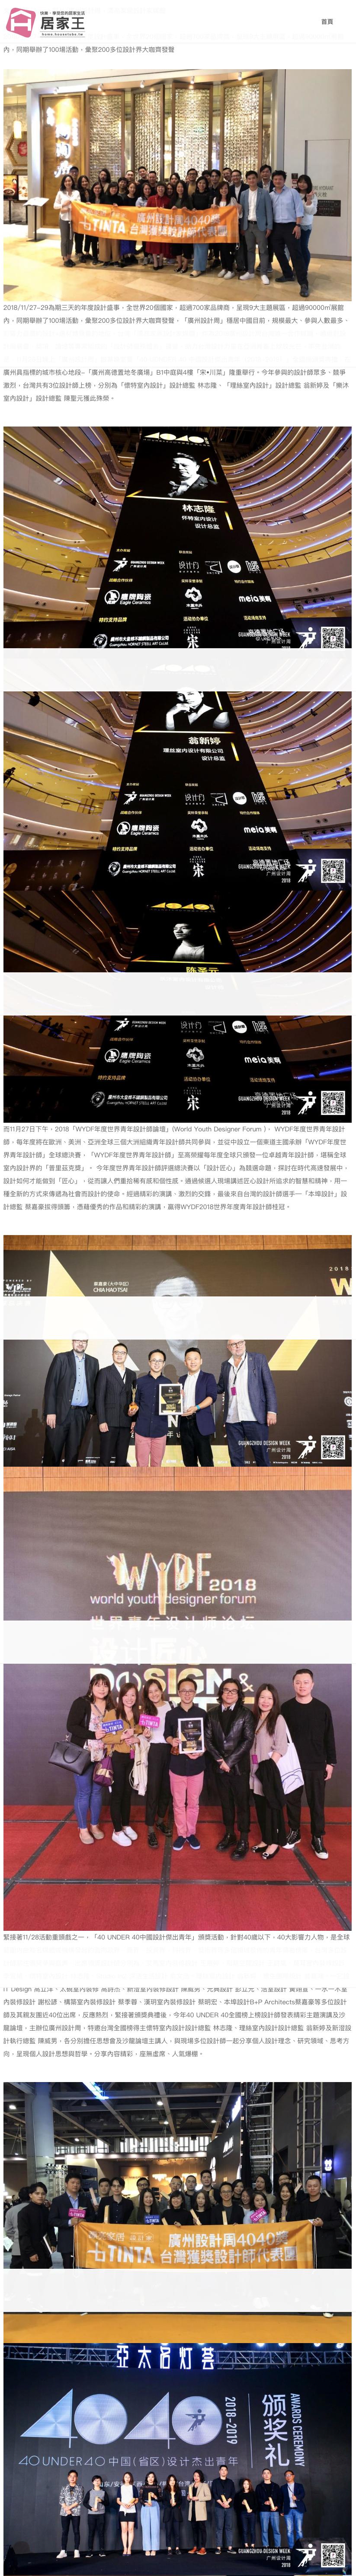 FireShot Capture 091 - 2018廣州設計周,台灣設計師載譽而歸-最新聞-設計家-居家王 - home.housetube.tw.png